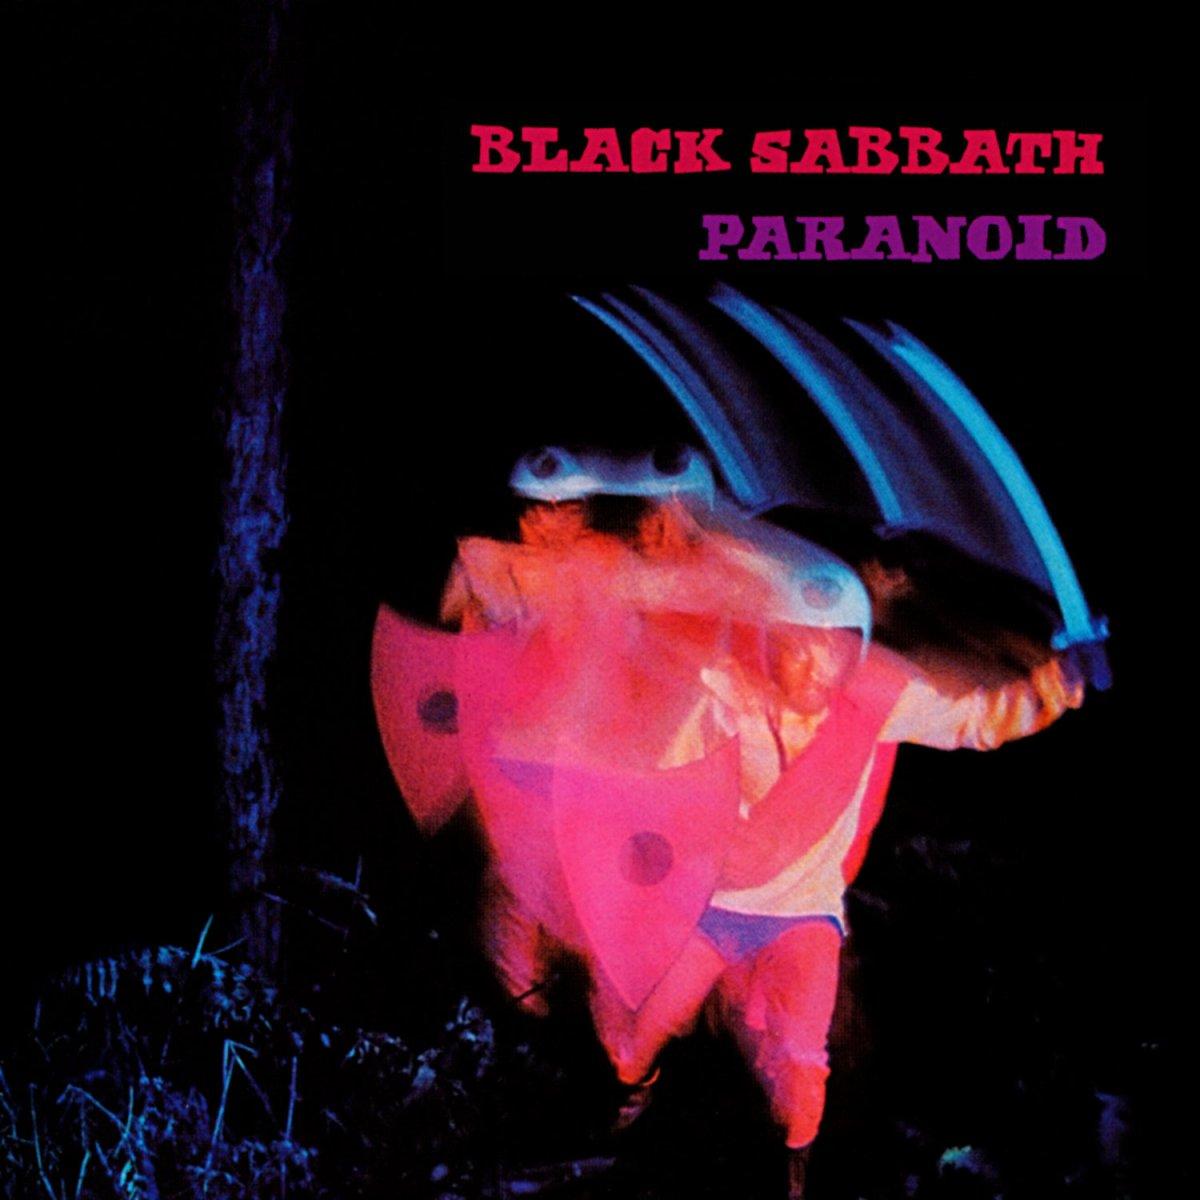 Black Sabbath's Paranoid